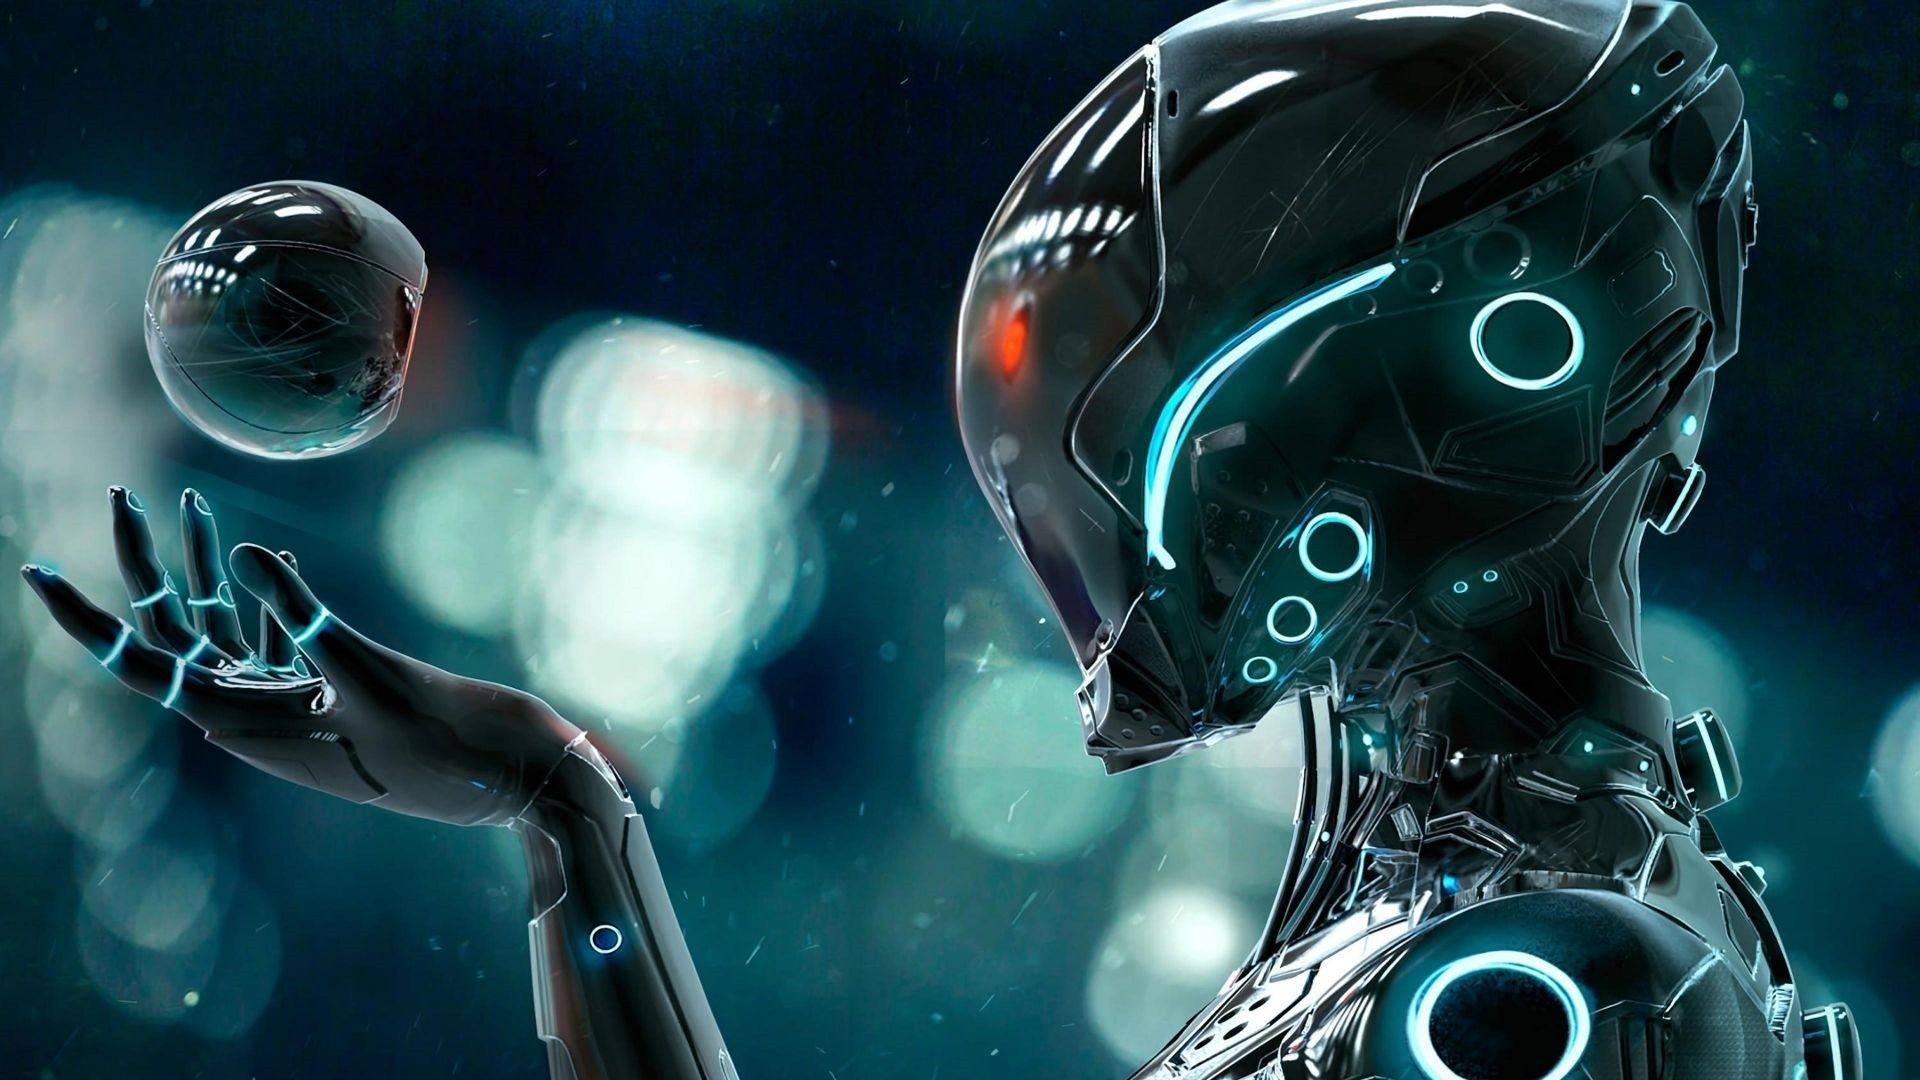 Robot Full HD Wallpaper